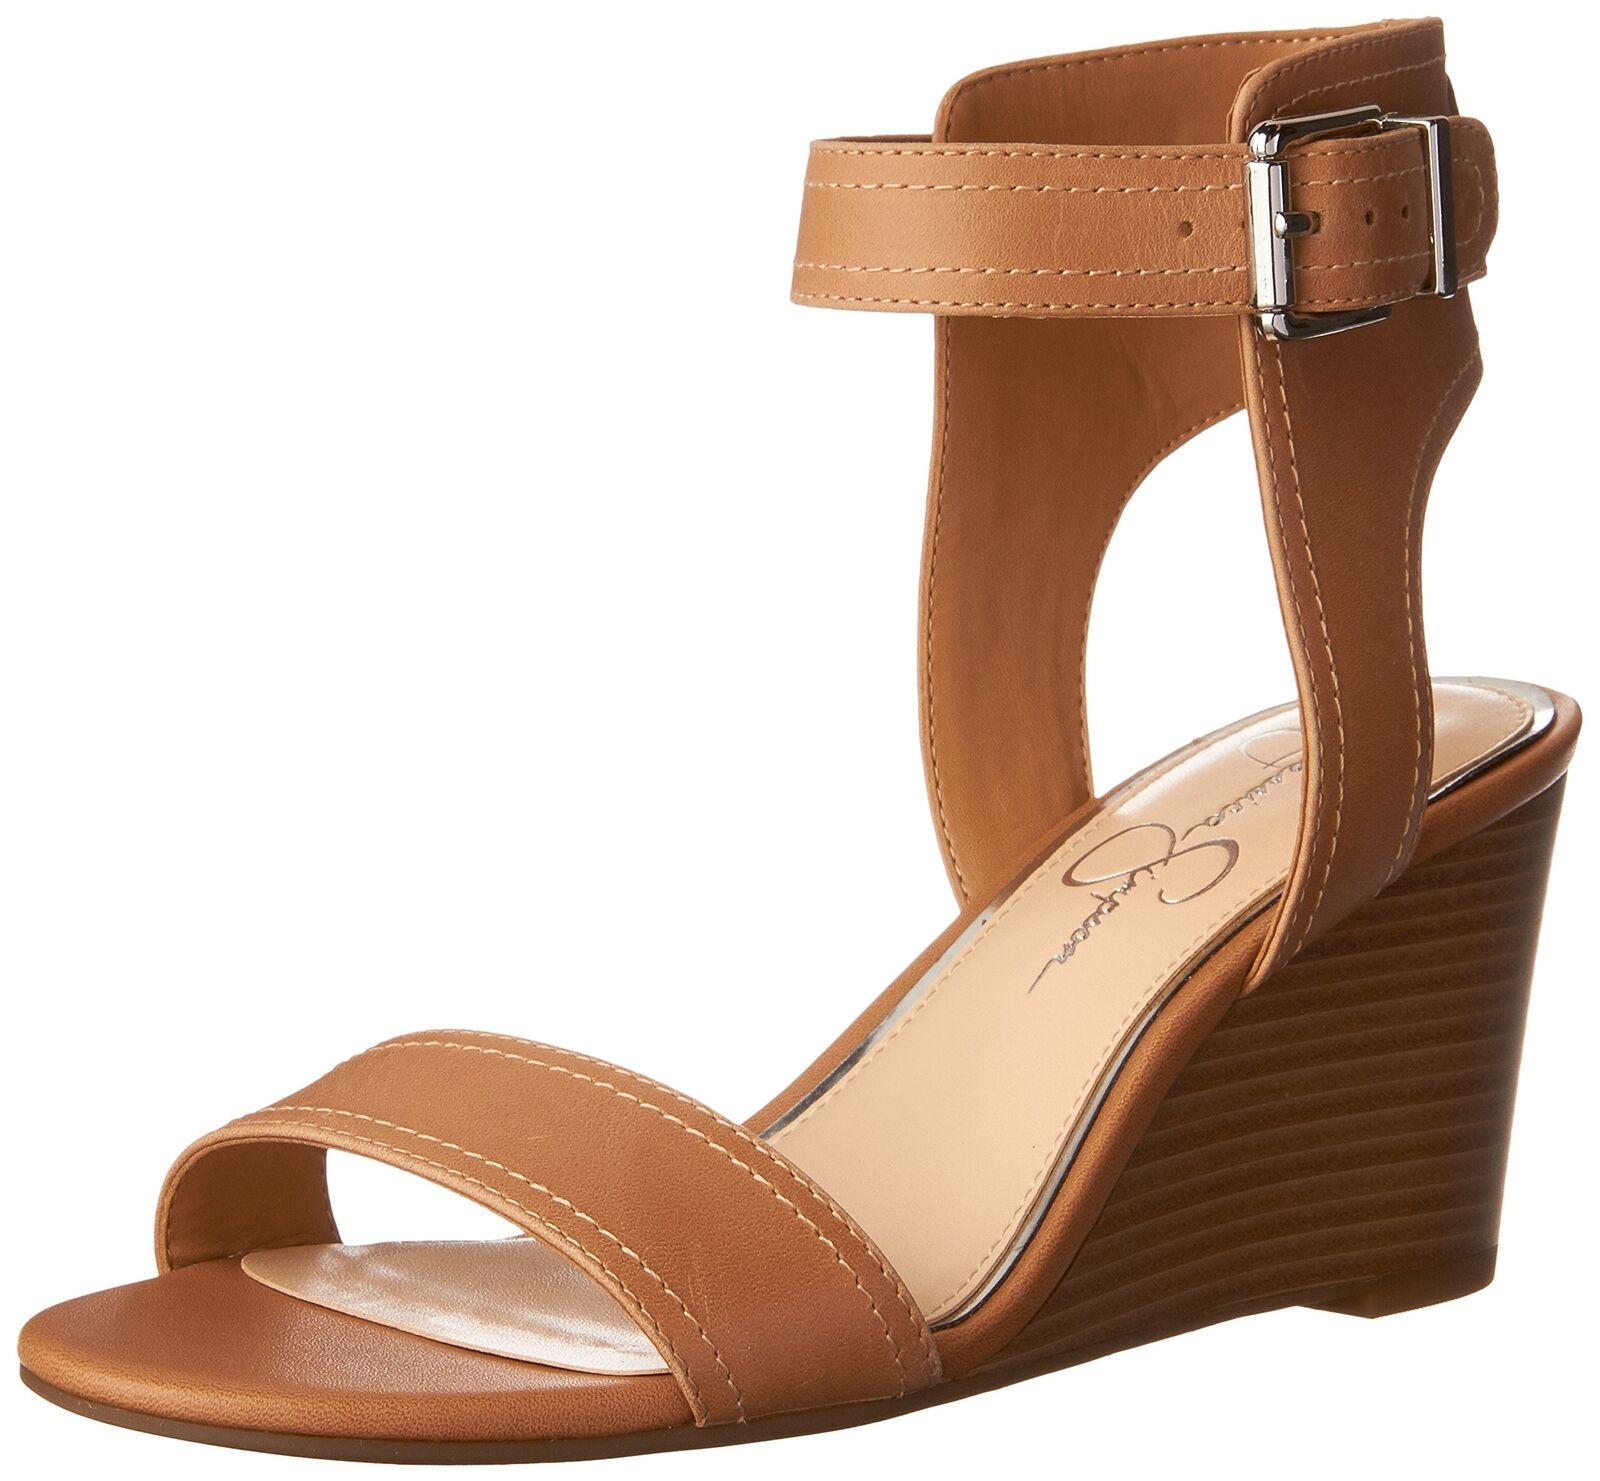 Jessica Simpson Women's Cristabel Wedge Sandal Buff 6.5 B(M) US